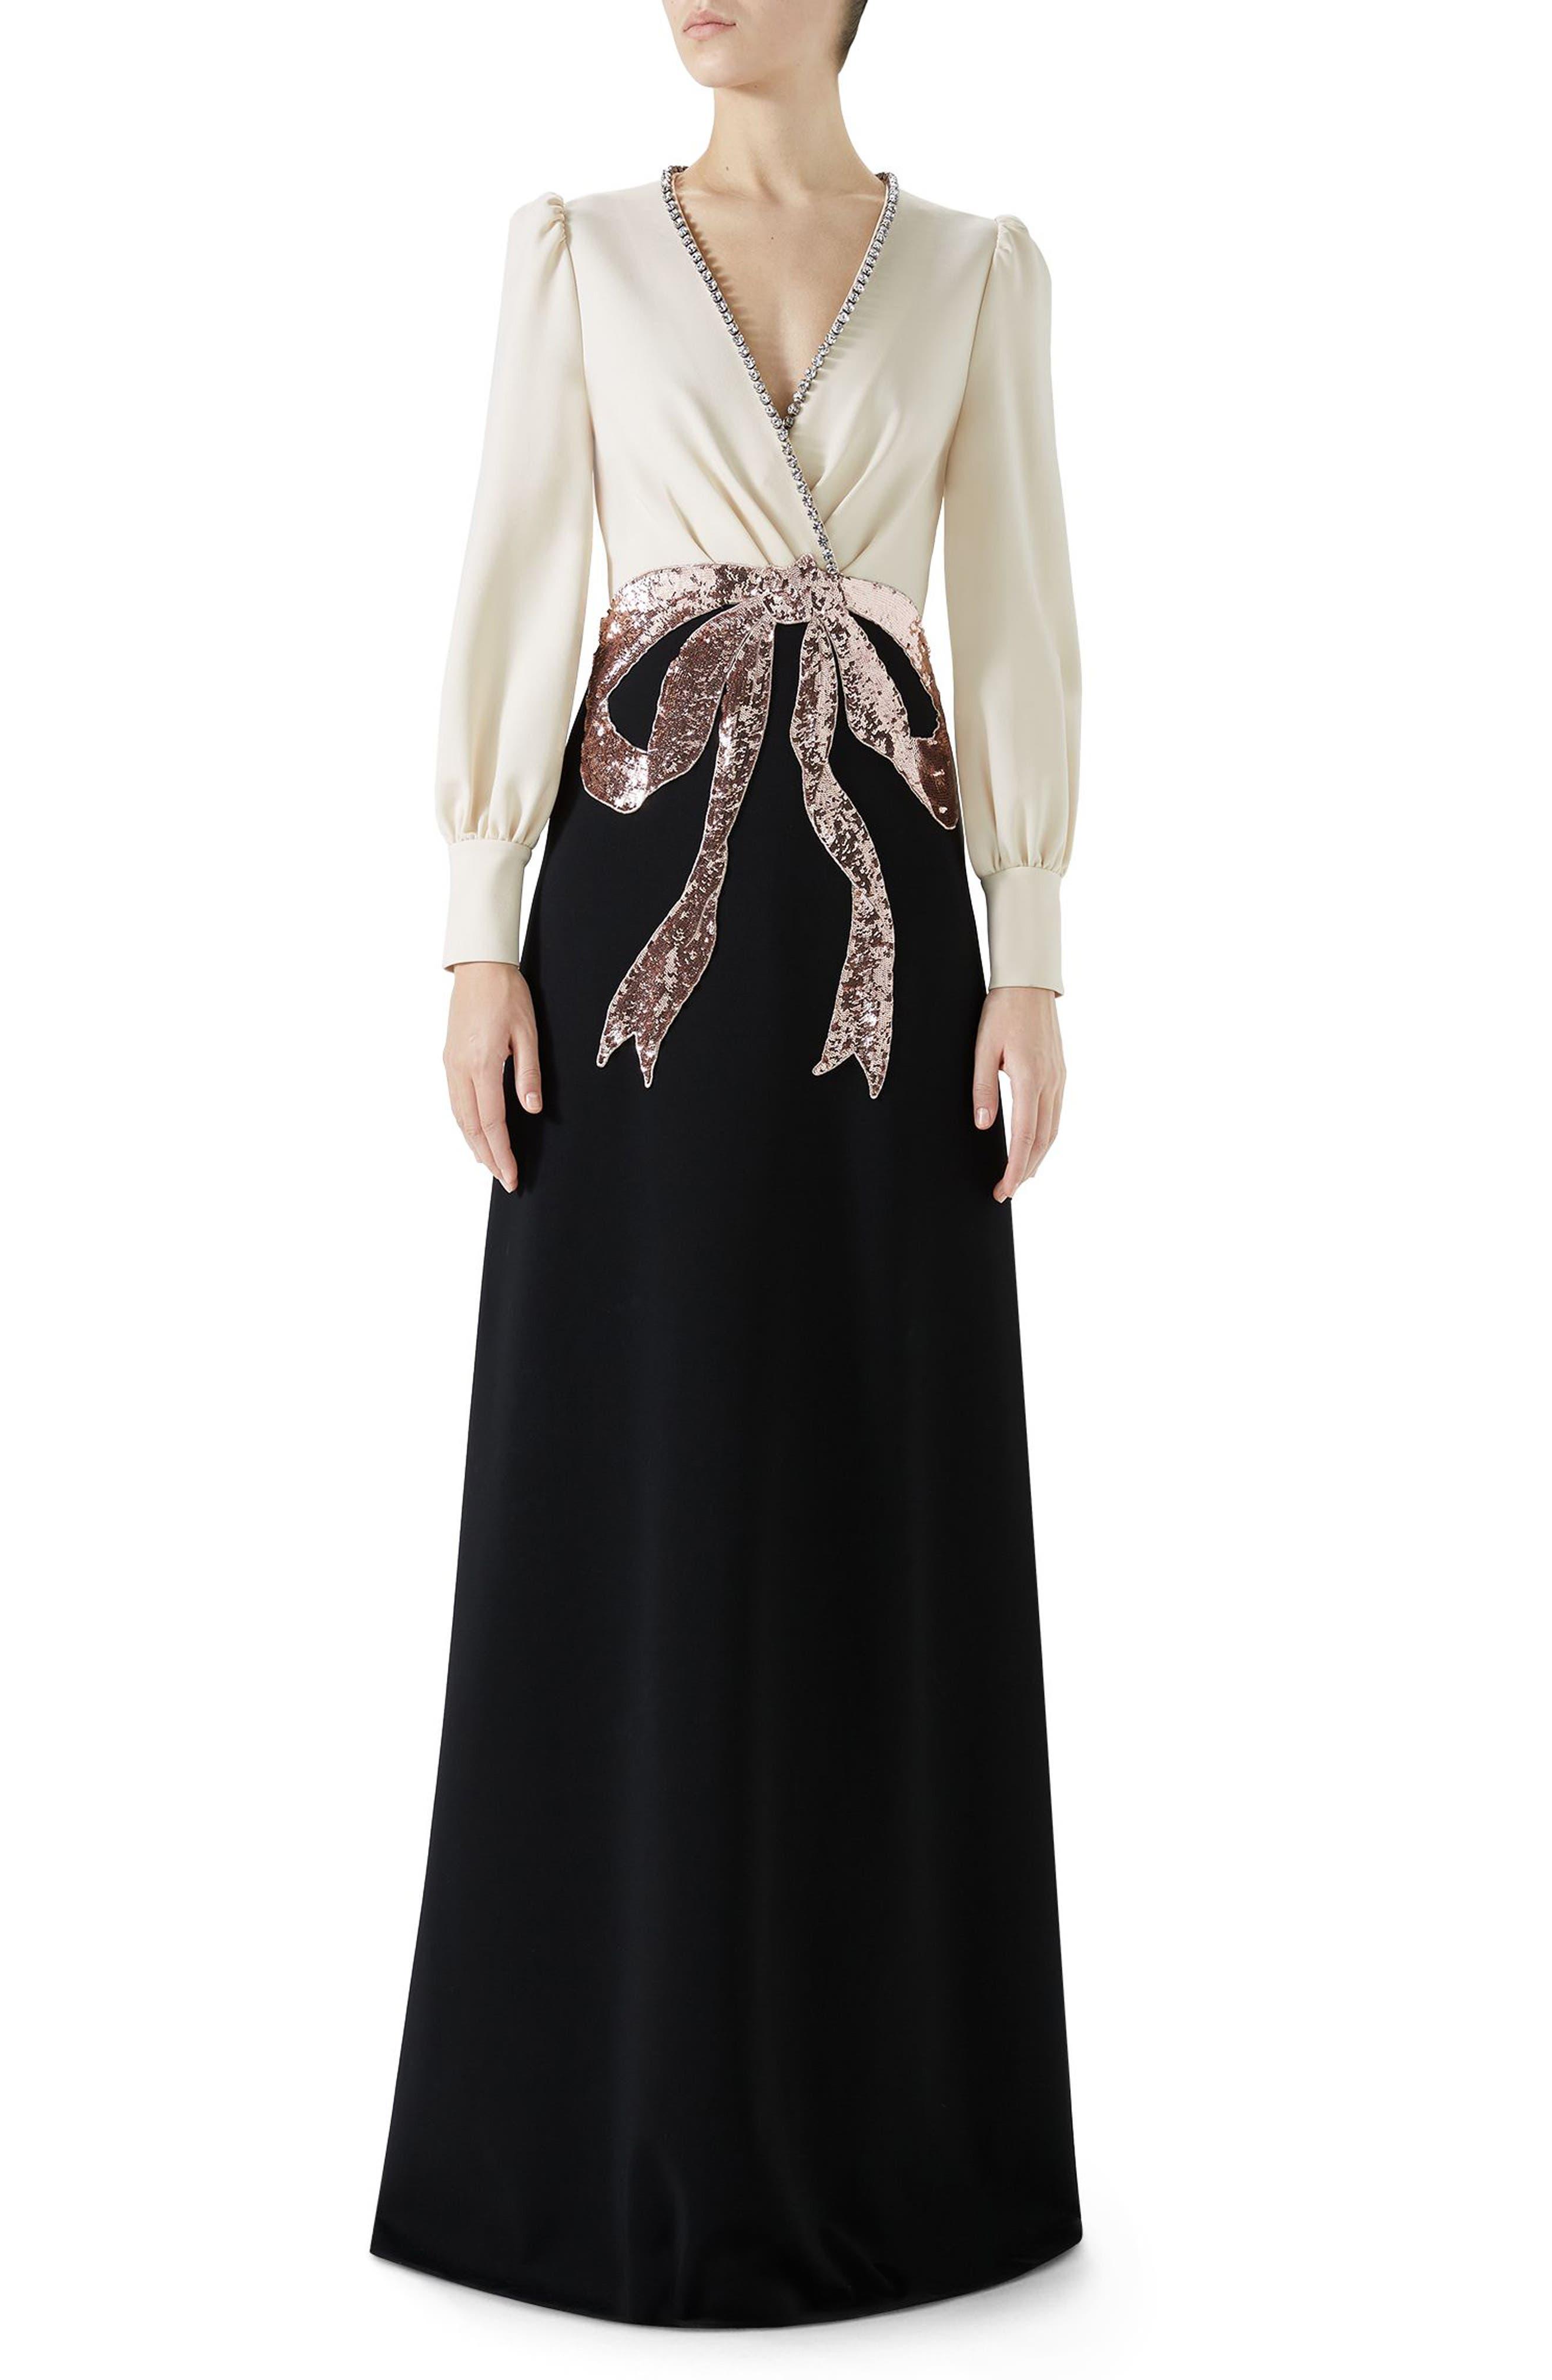 Trompe L'Oeil Bow Stretch Jersey Gown,                             Main thumbnail 1, color,                             Black/ Almond Flower